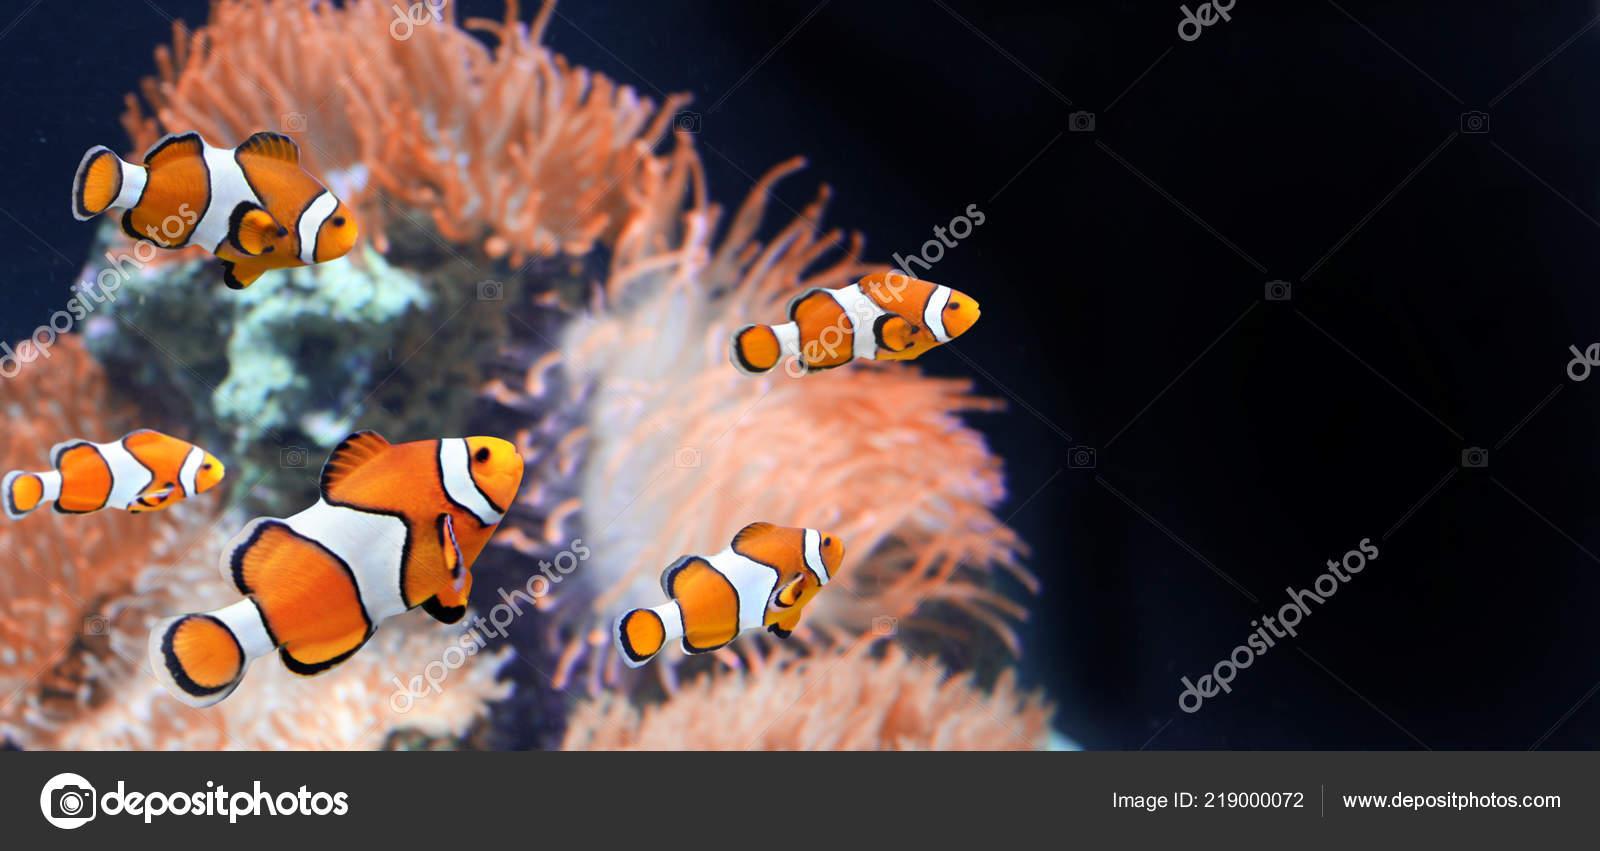 sea anemone clown fish marine aquarium black background mock